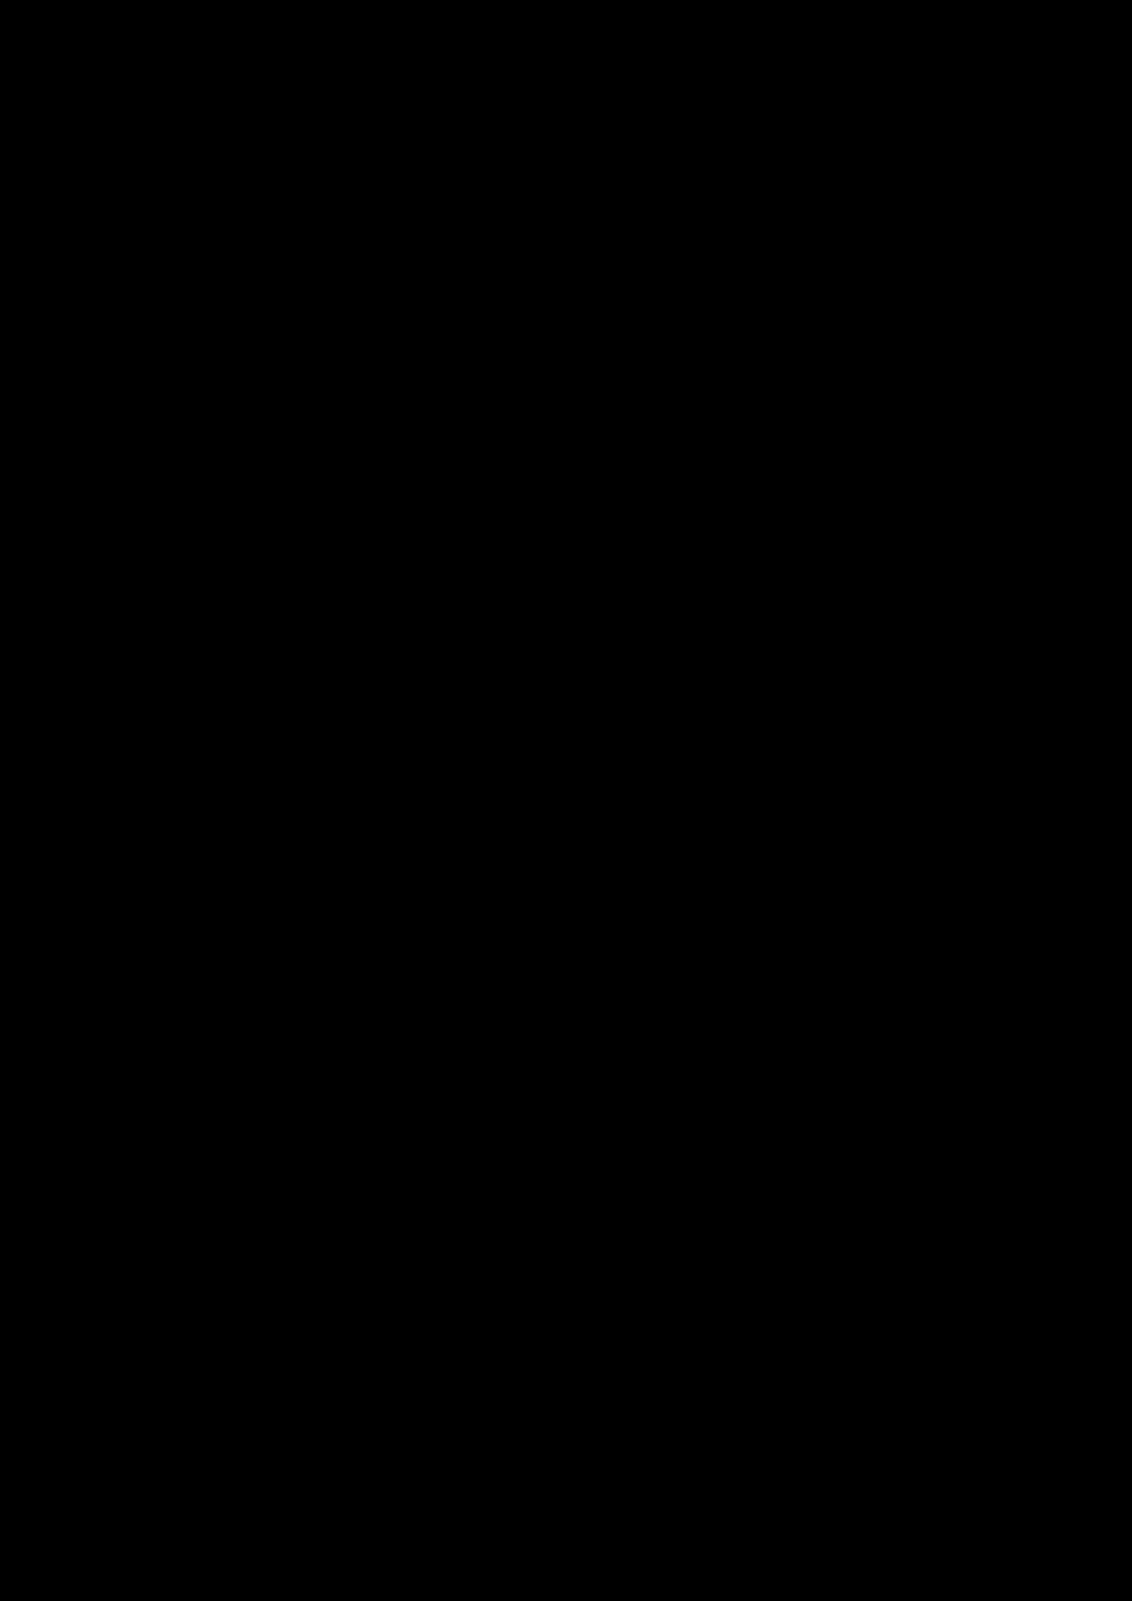 Belyiy sokol slide, Image 82